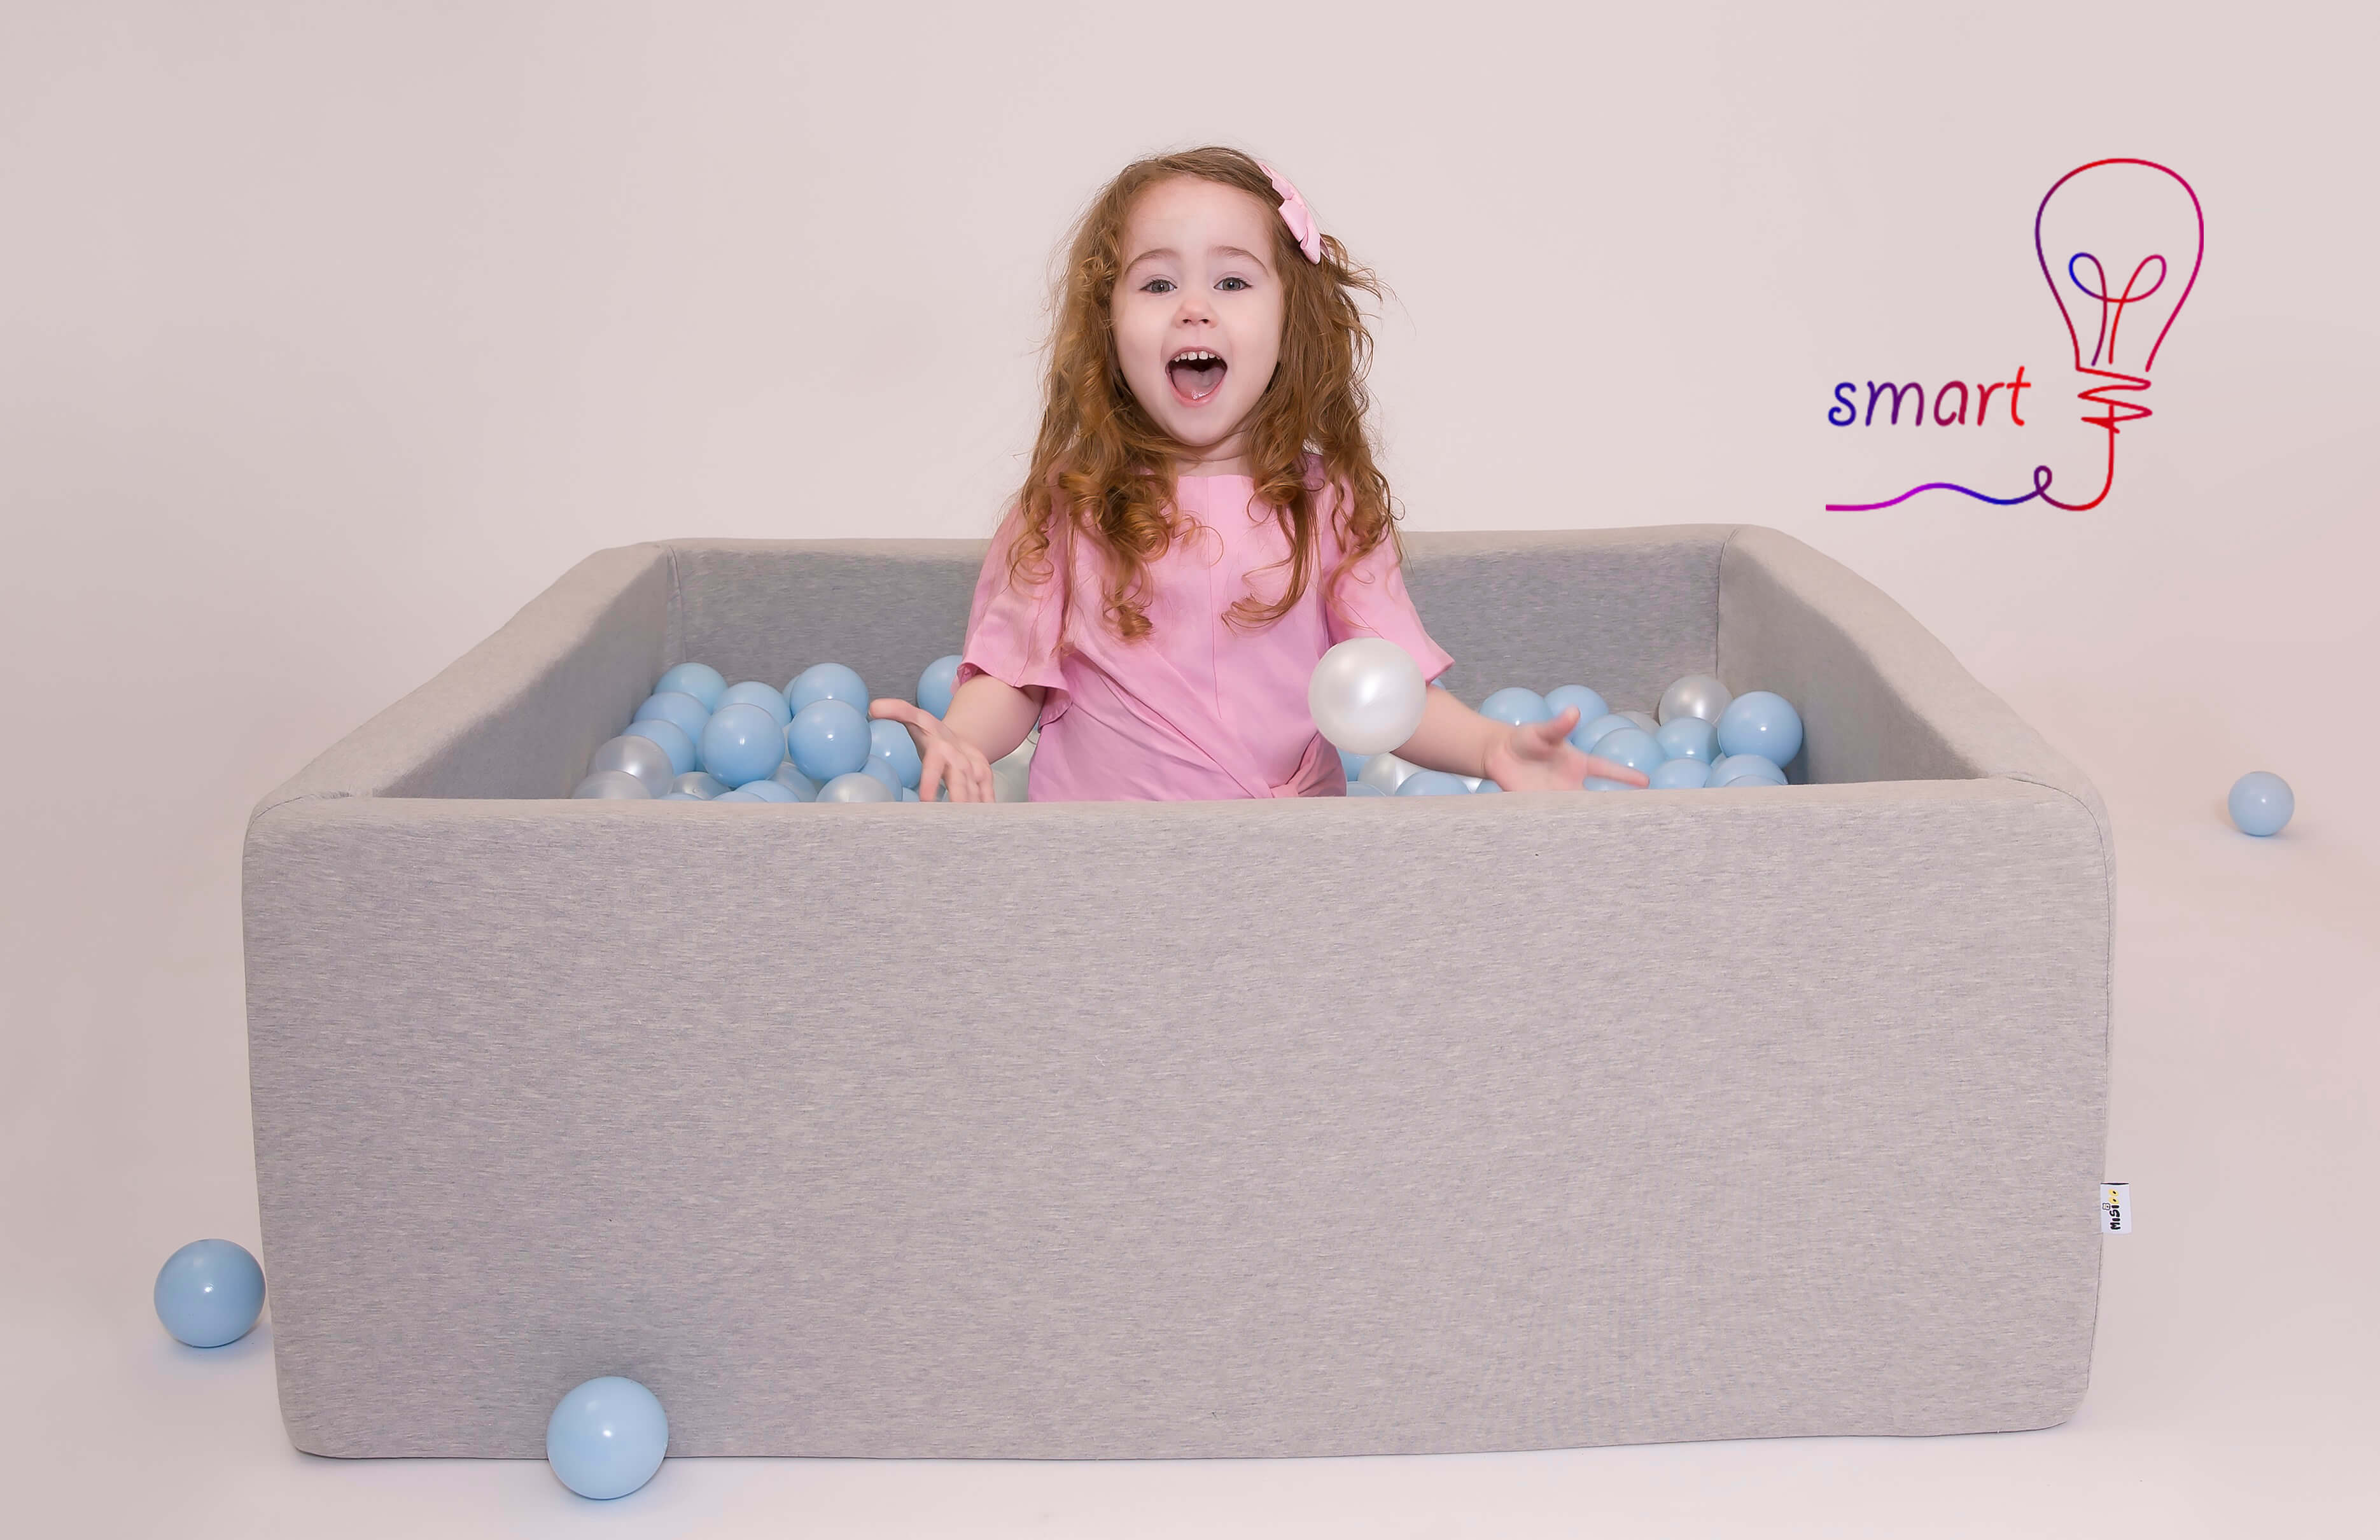 baby bällebad grau - kollektionen smart